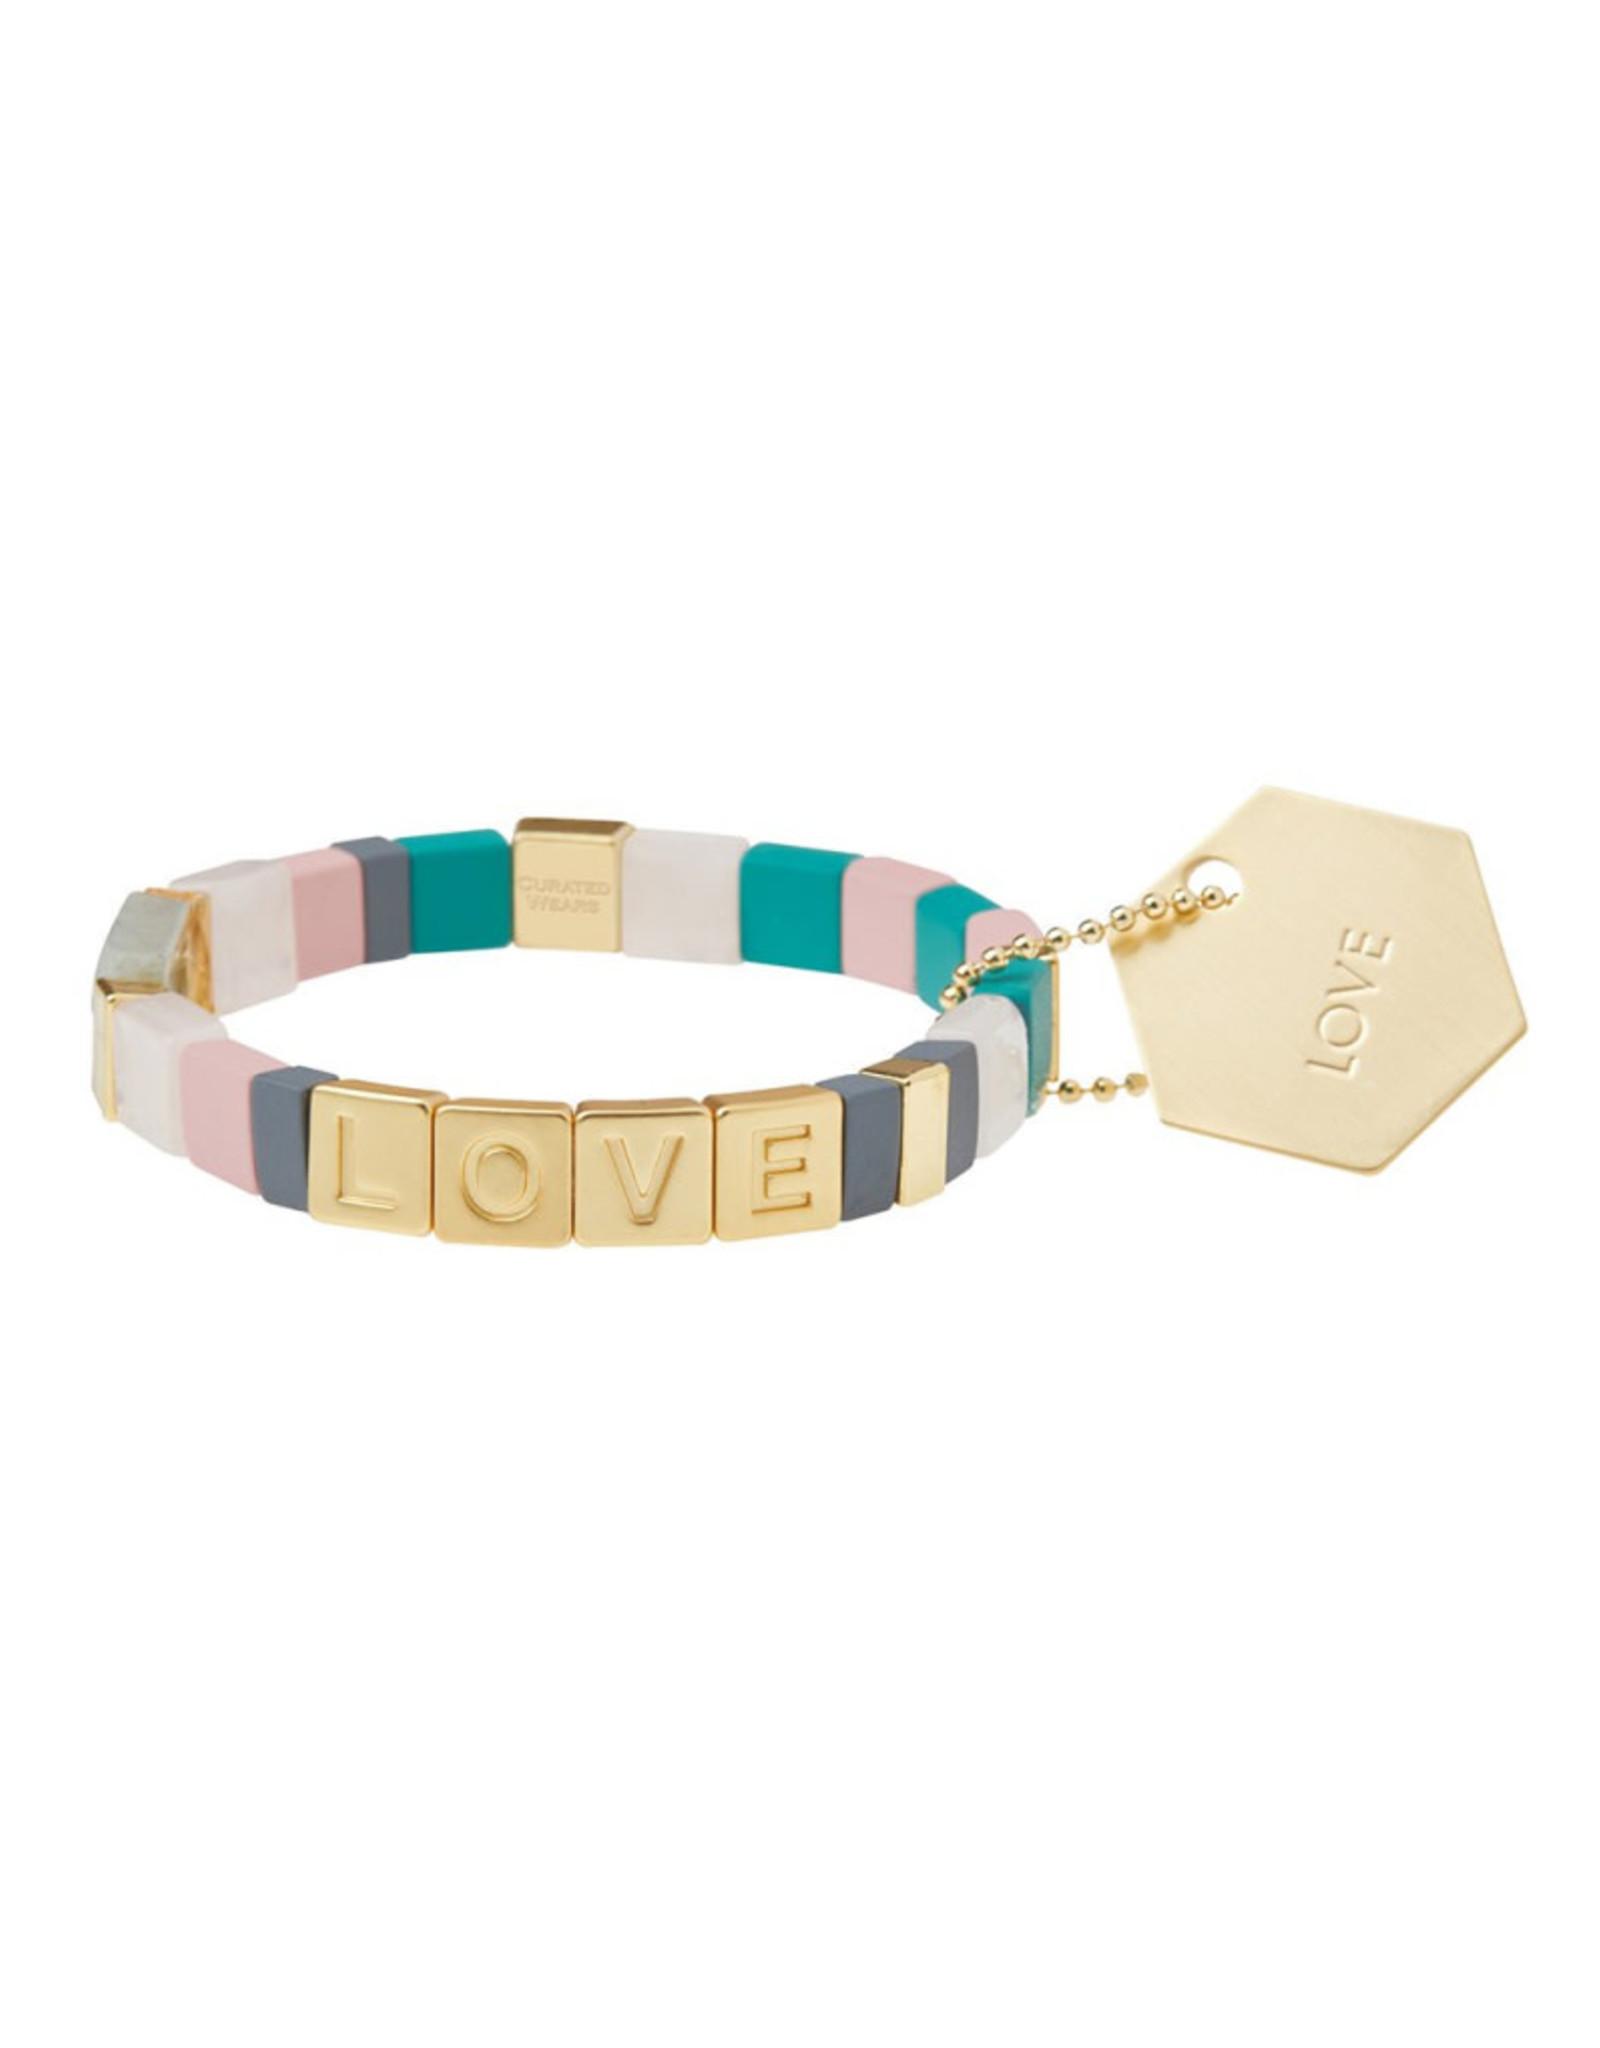 "Empower Bracelet - ""Love"" - Gold/Rose Quartz/Labradorite"